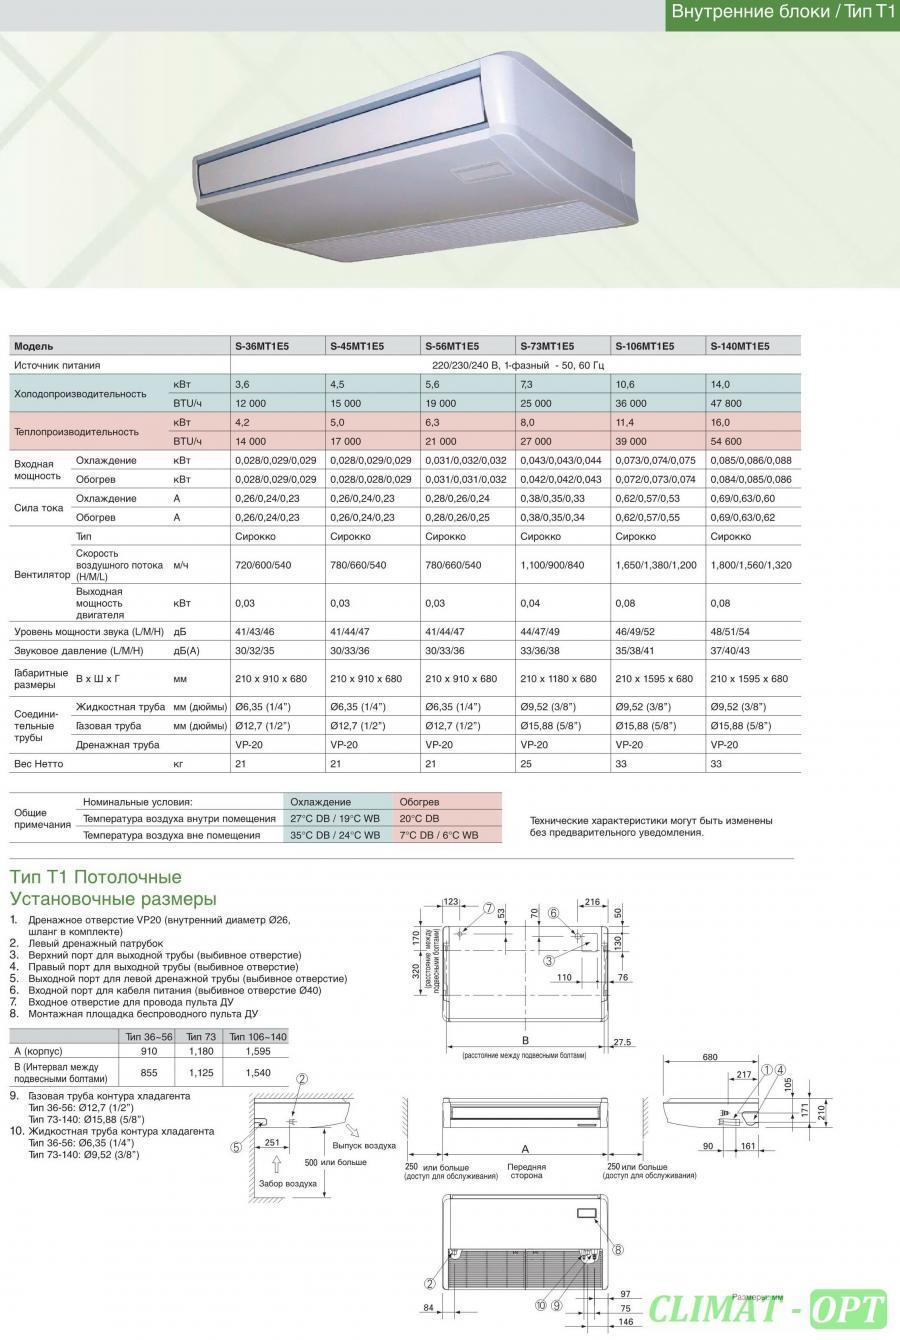 Внутренние блоки потолочного типа Panasonic T1